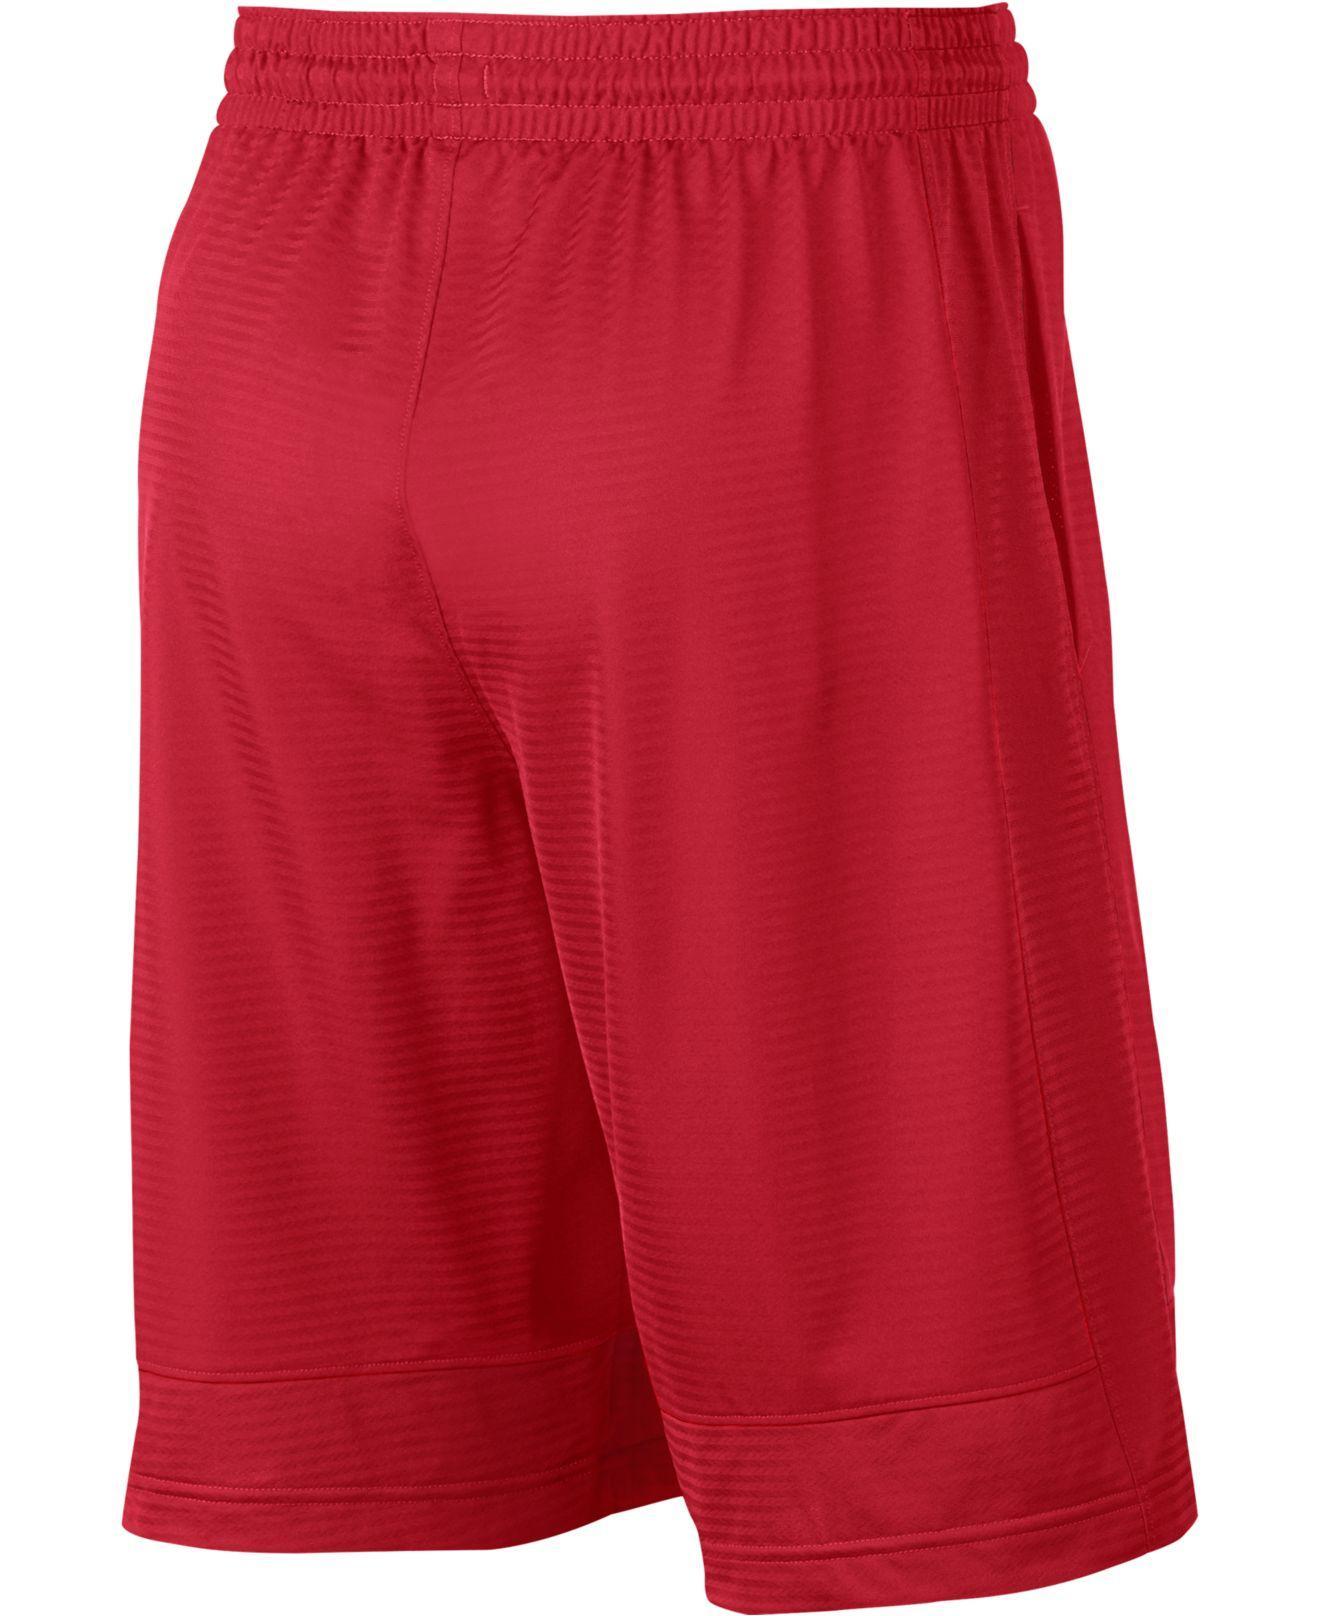 37d0d166062 Lyst - Nike Men s Dri-fit Fast Break Basketball Shorts in Red for Men